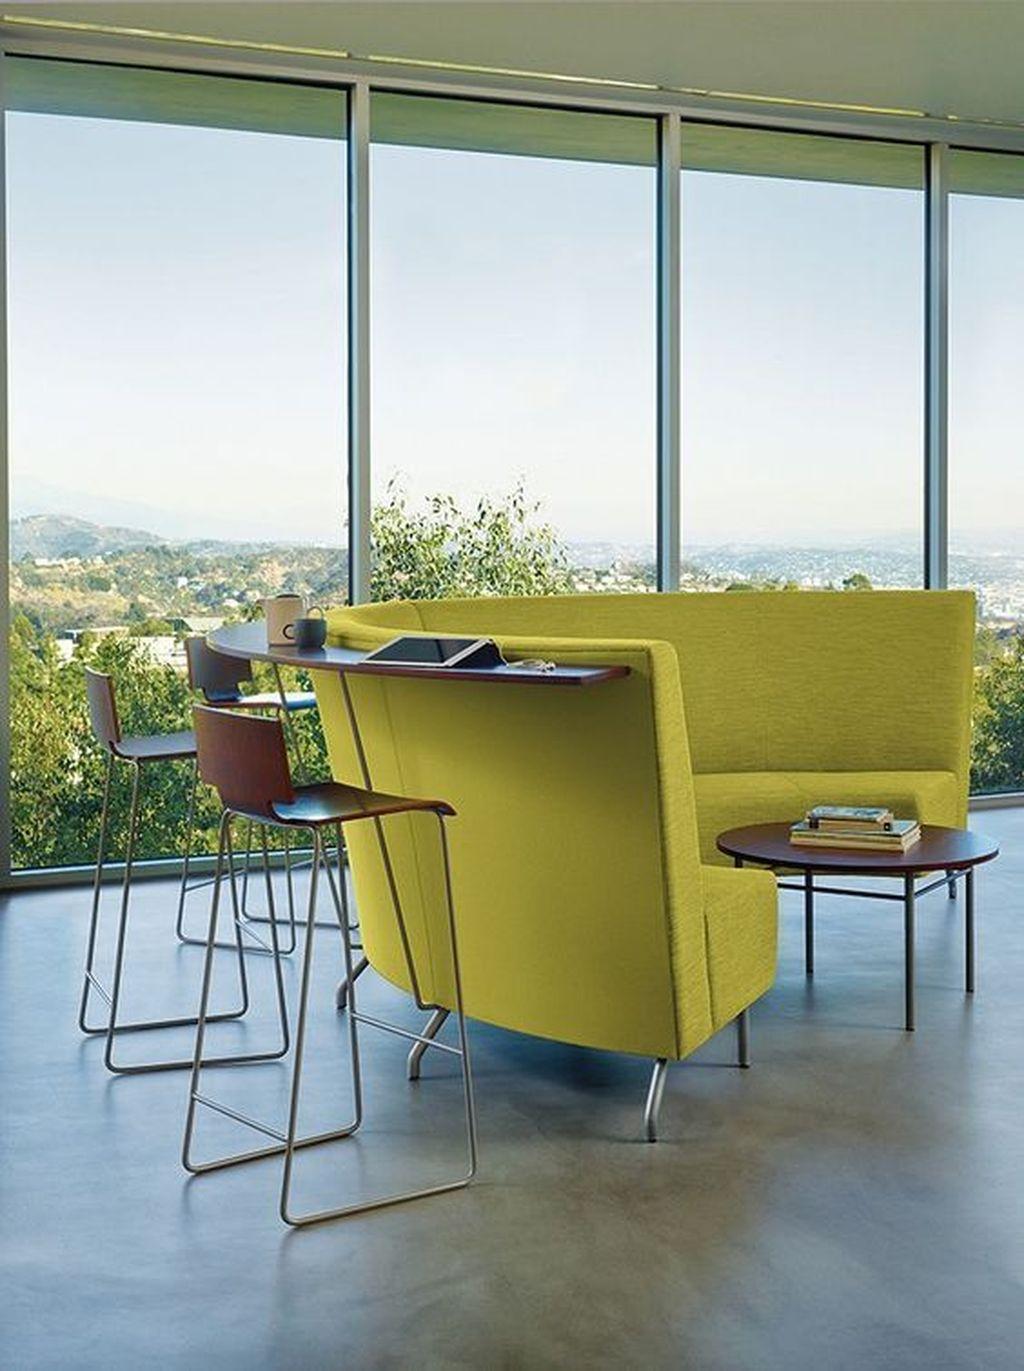 Best Multi Functional Furniture Design Ideas That For Apartment 31